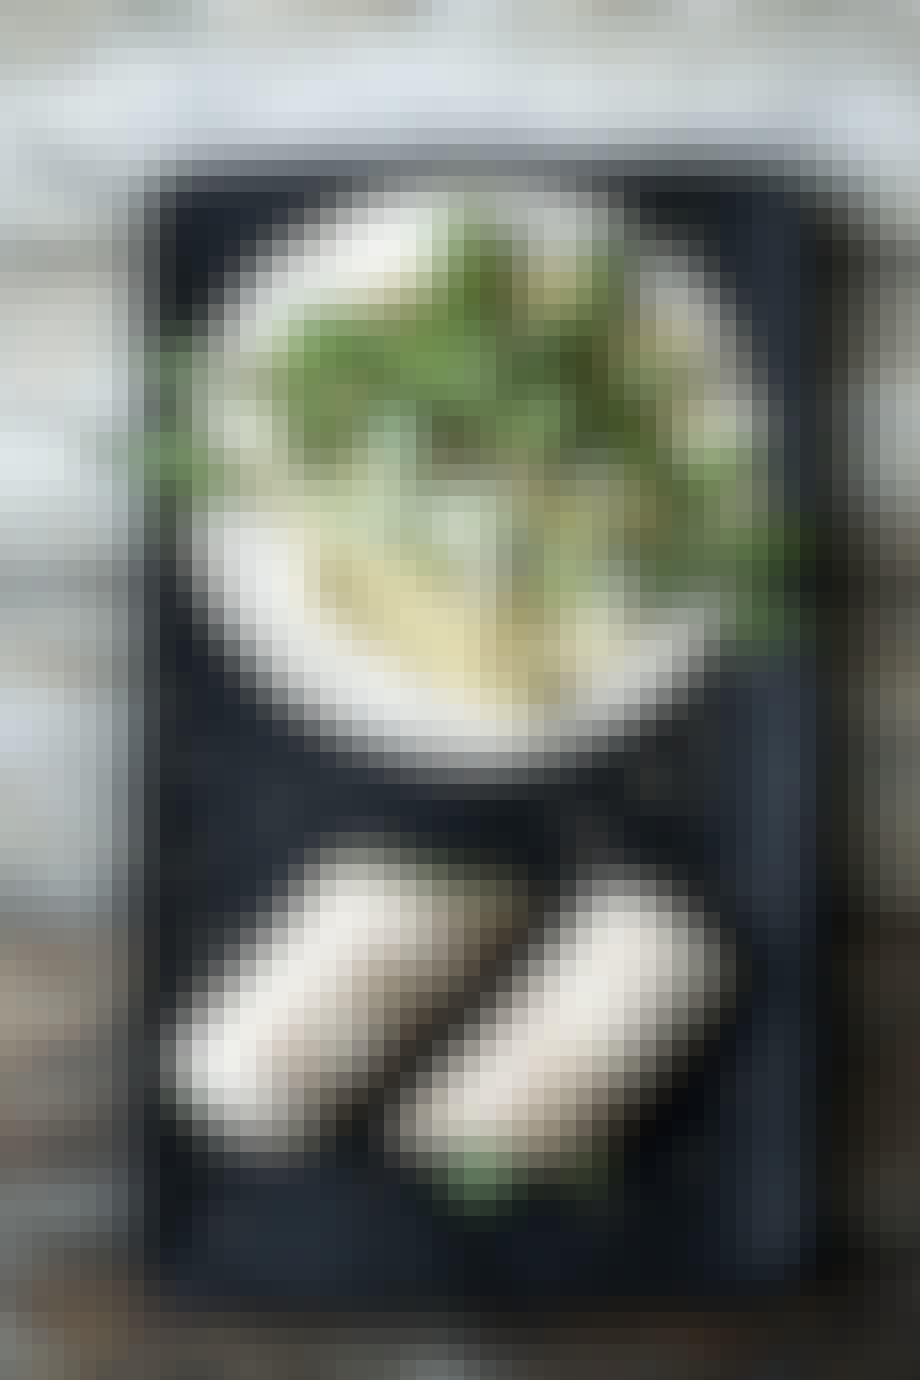 Vegge-wrap med hummus, kål, spicy agurk og sesam